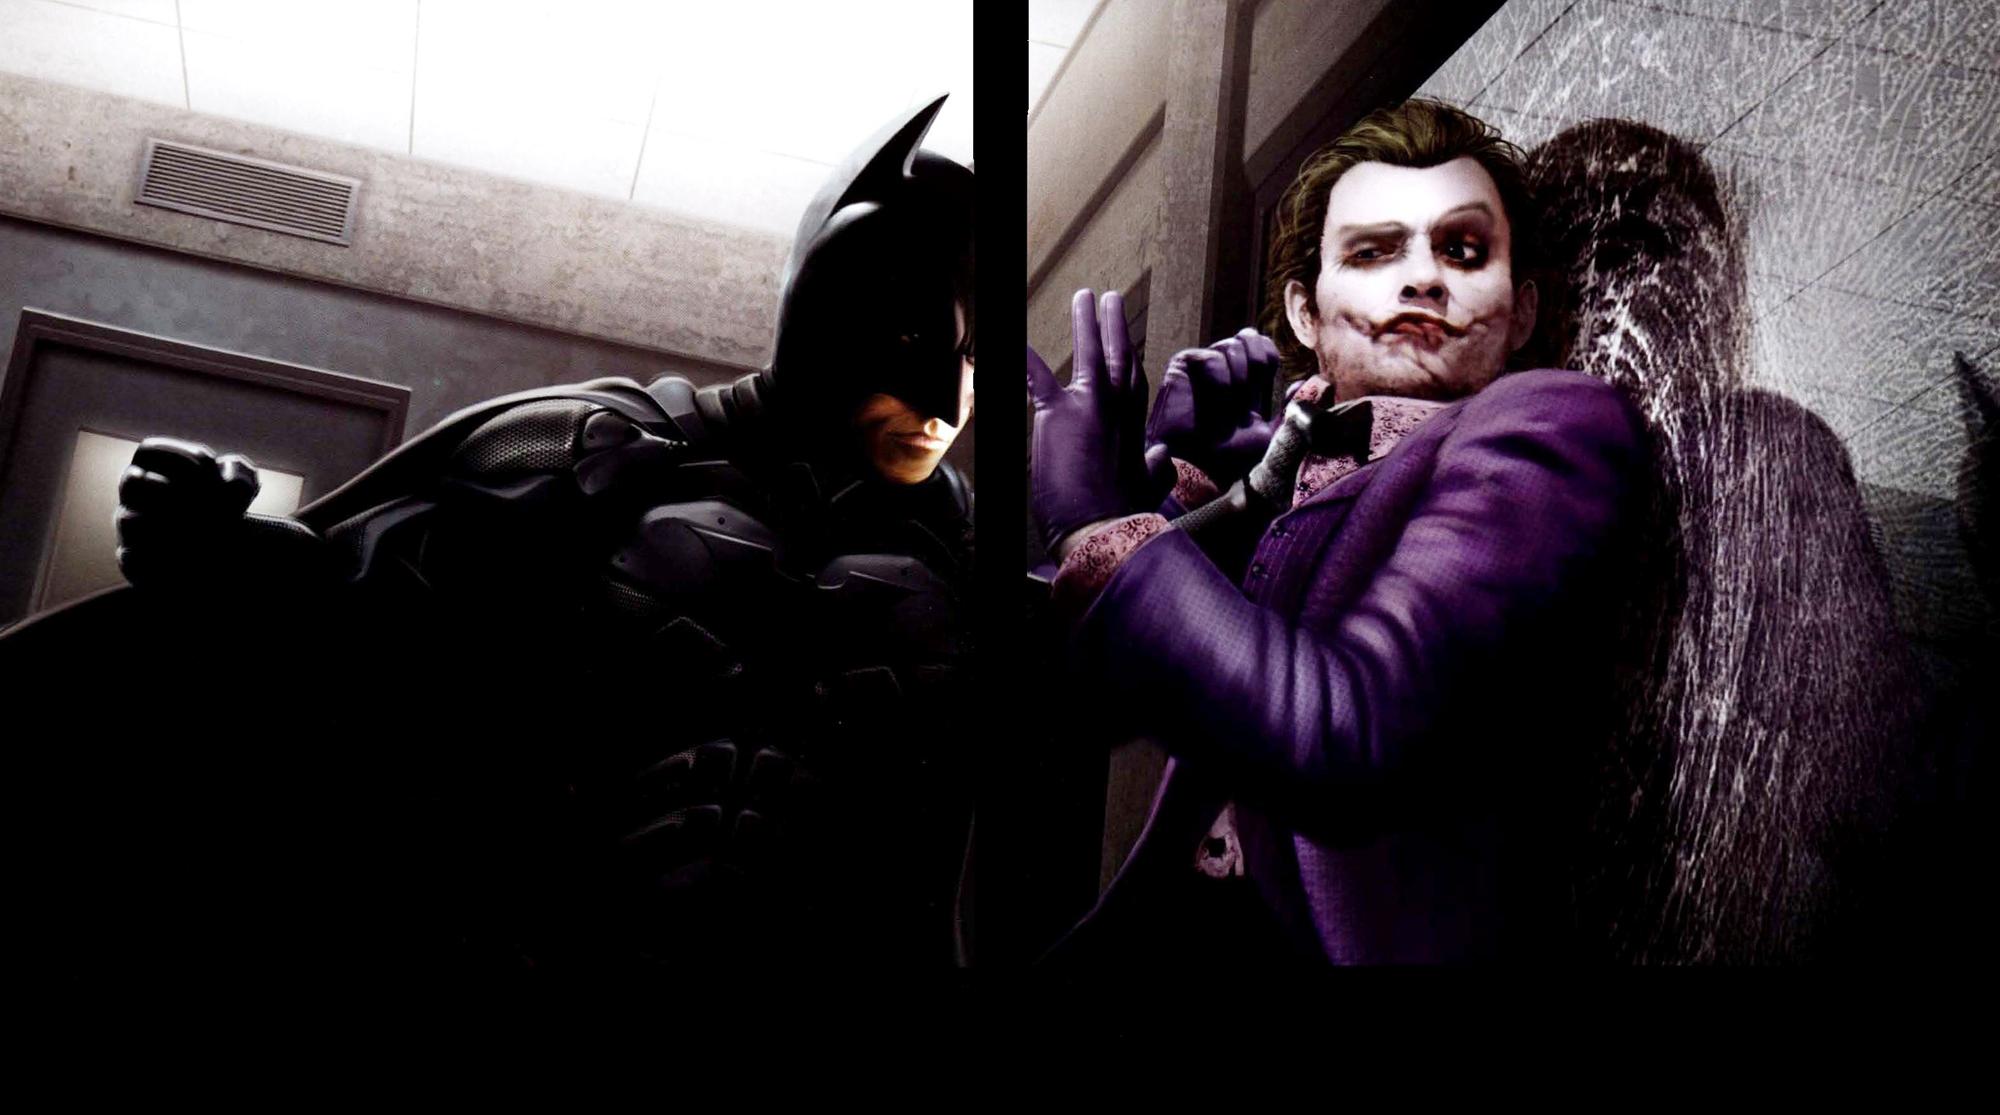 Joker From Batman Pictures Batman Vs The Joker